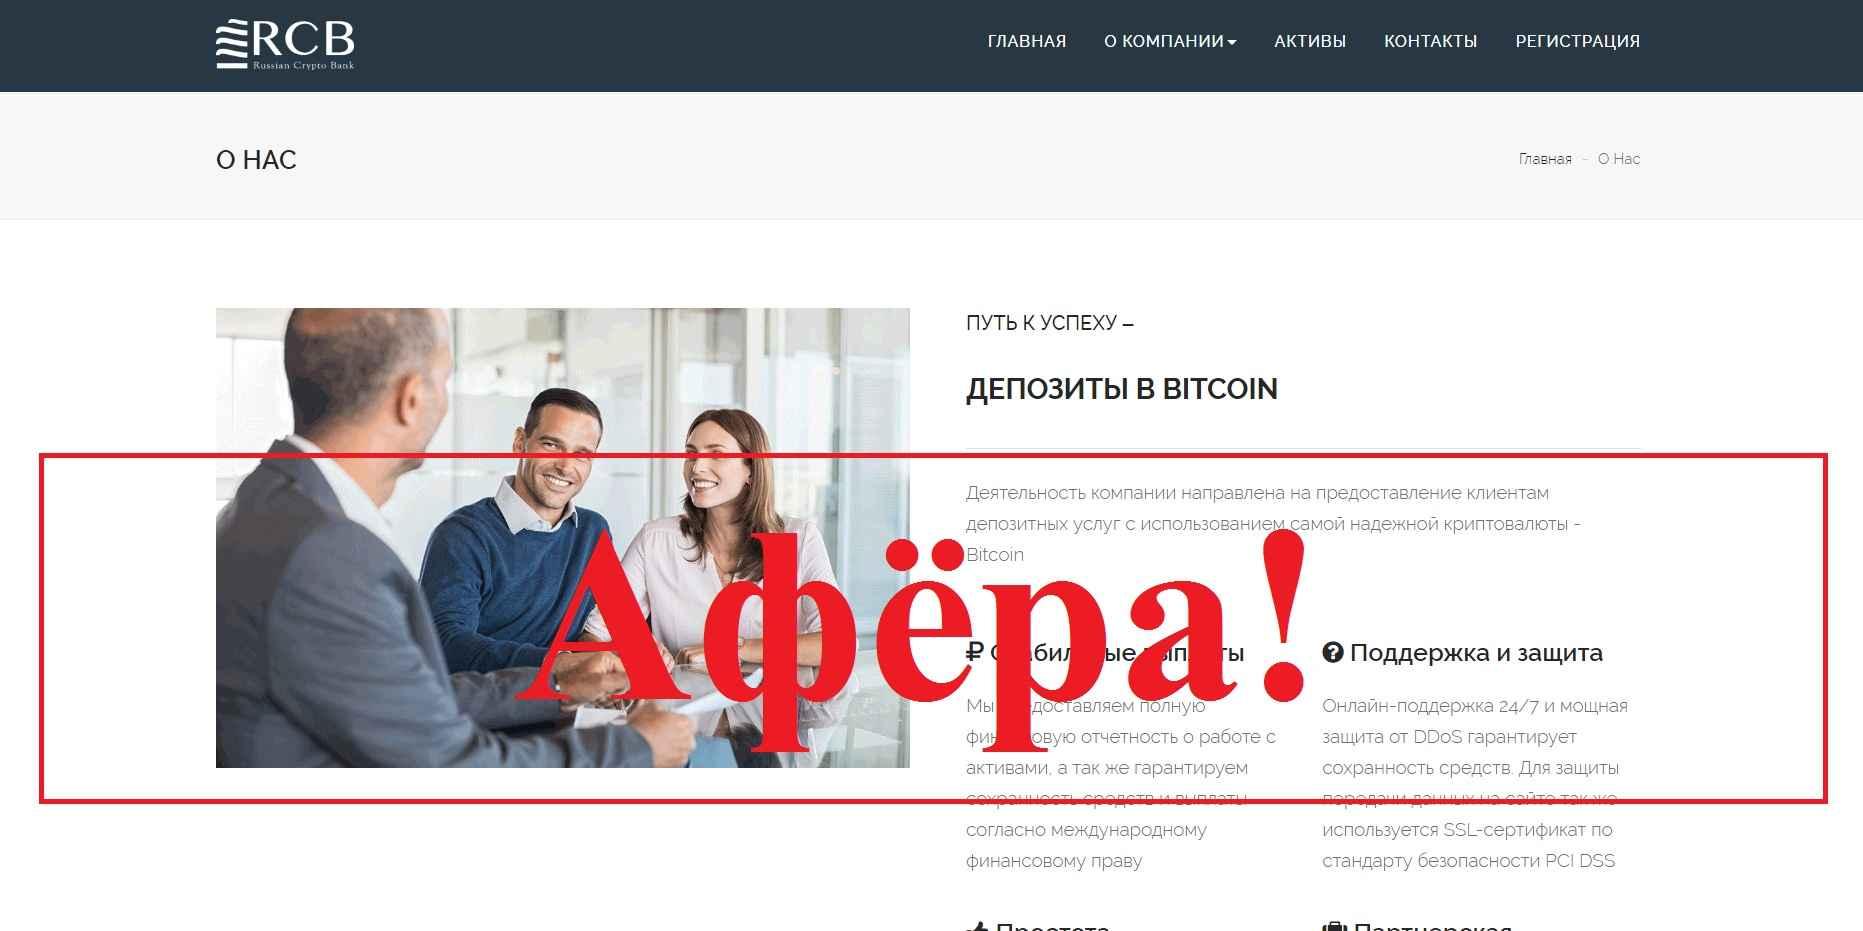 RCB Online – реальные отзывы о rcb-online.ru